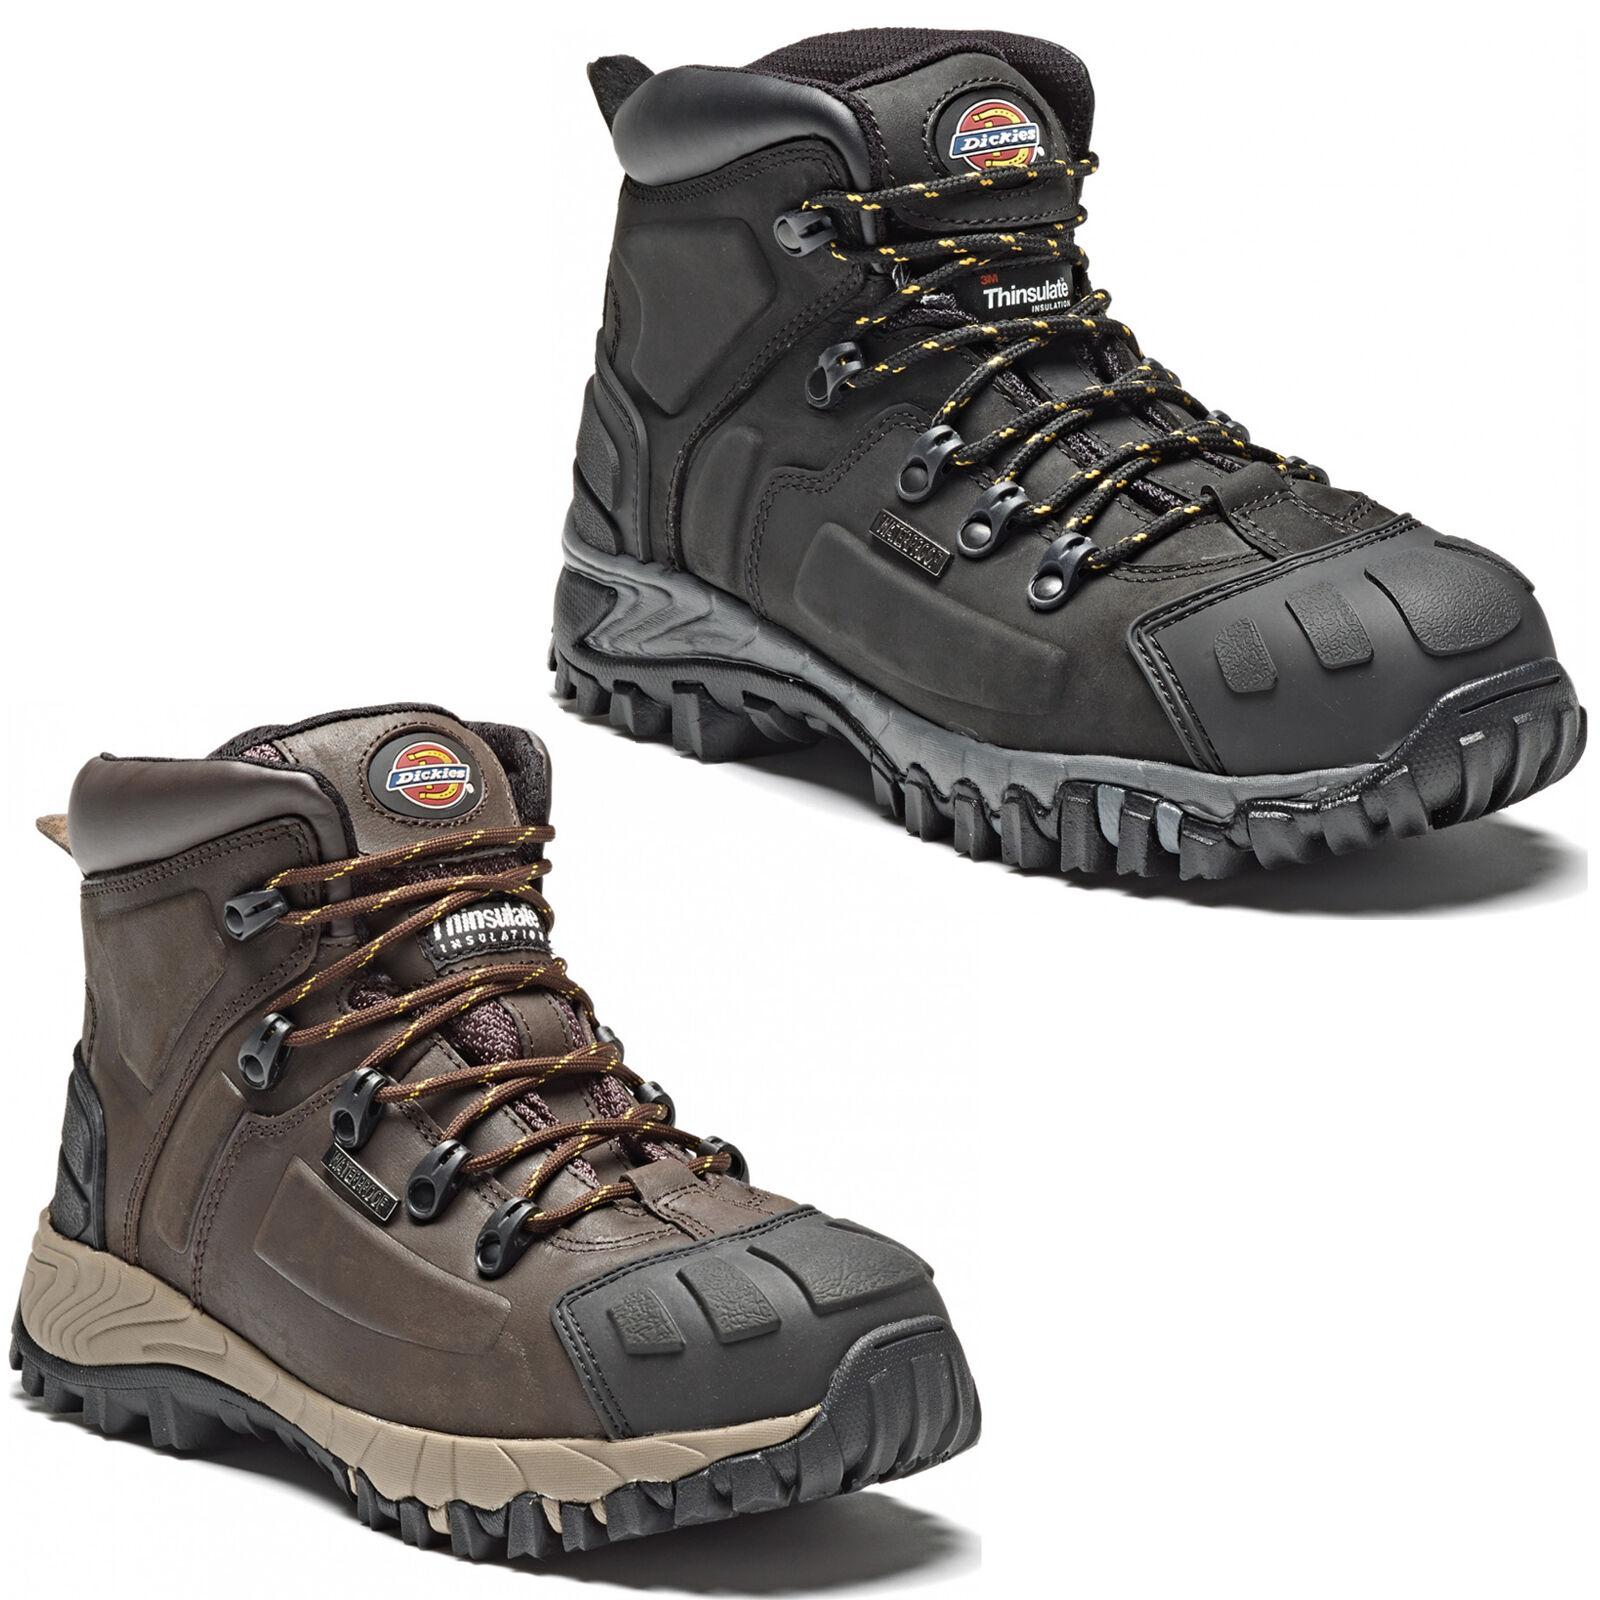 Dickies Medway Sicurezza Stivali Da Uomo Impermeabile In Acciaio Puntale Stivali uk6-12